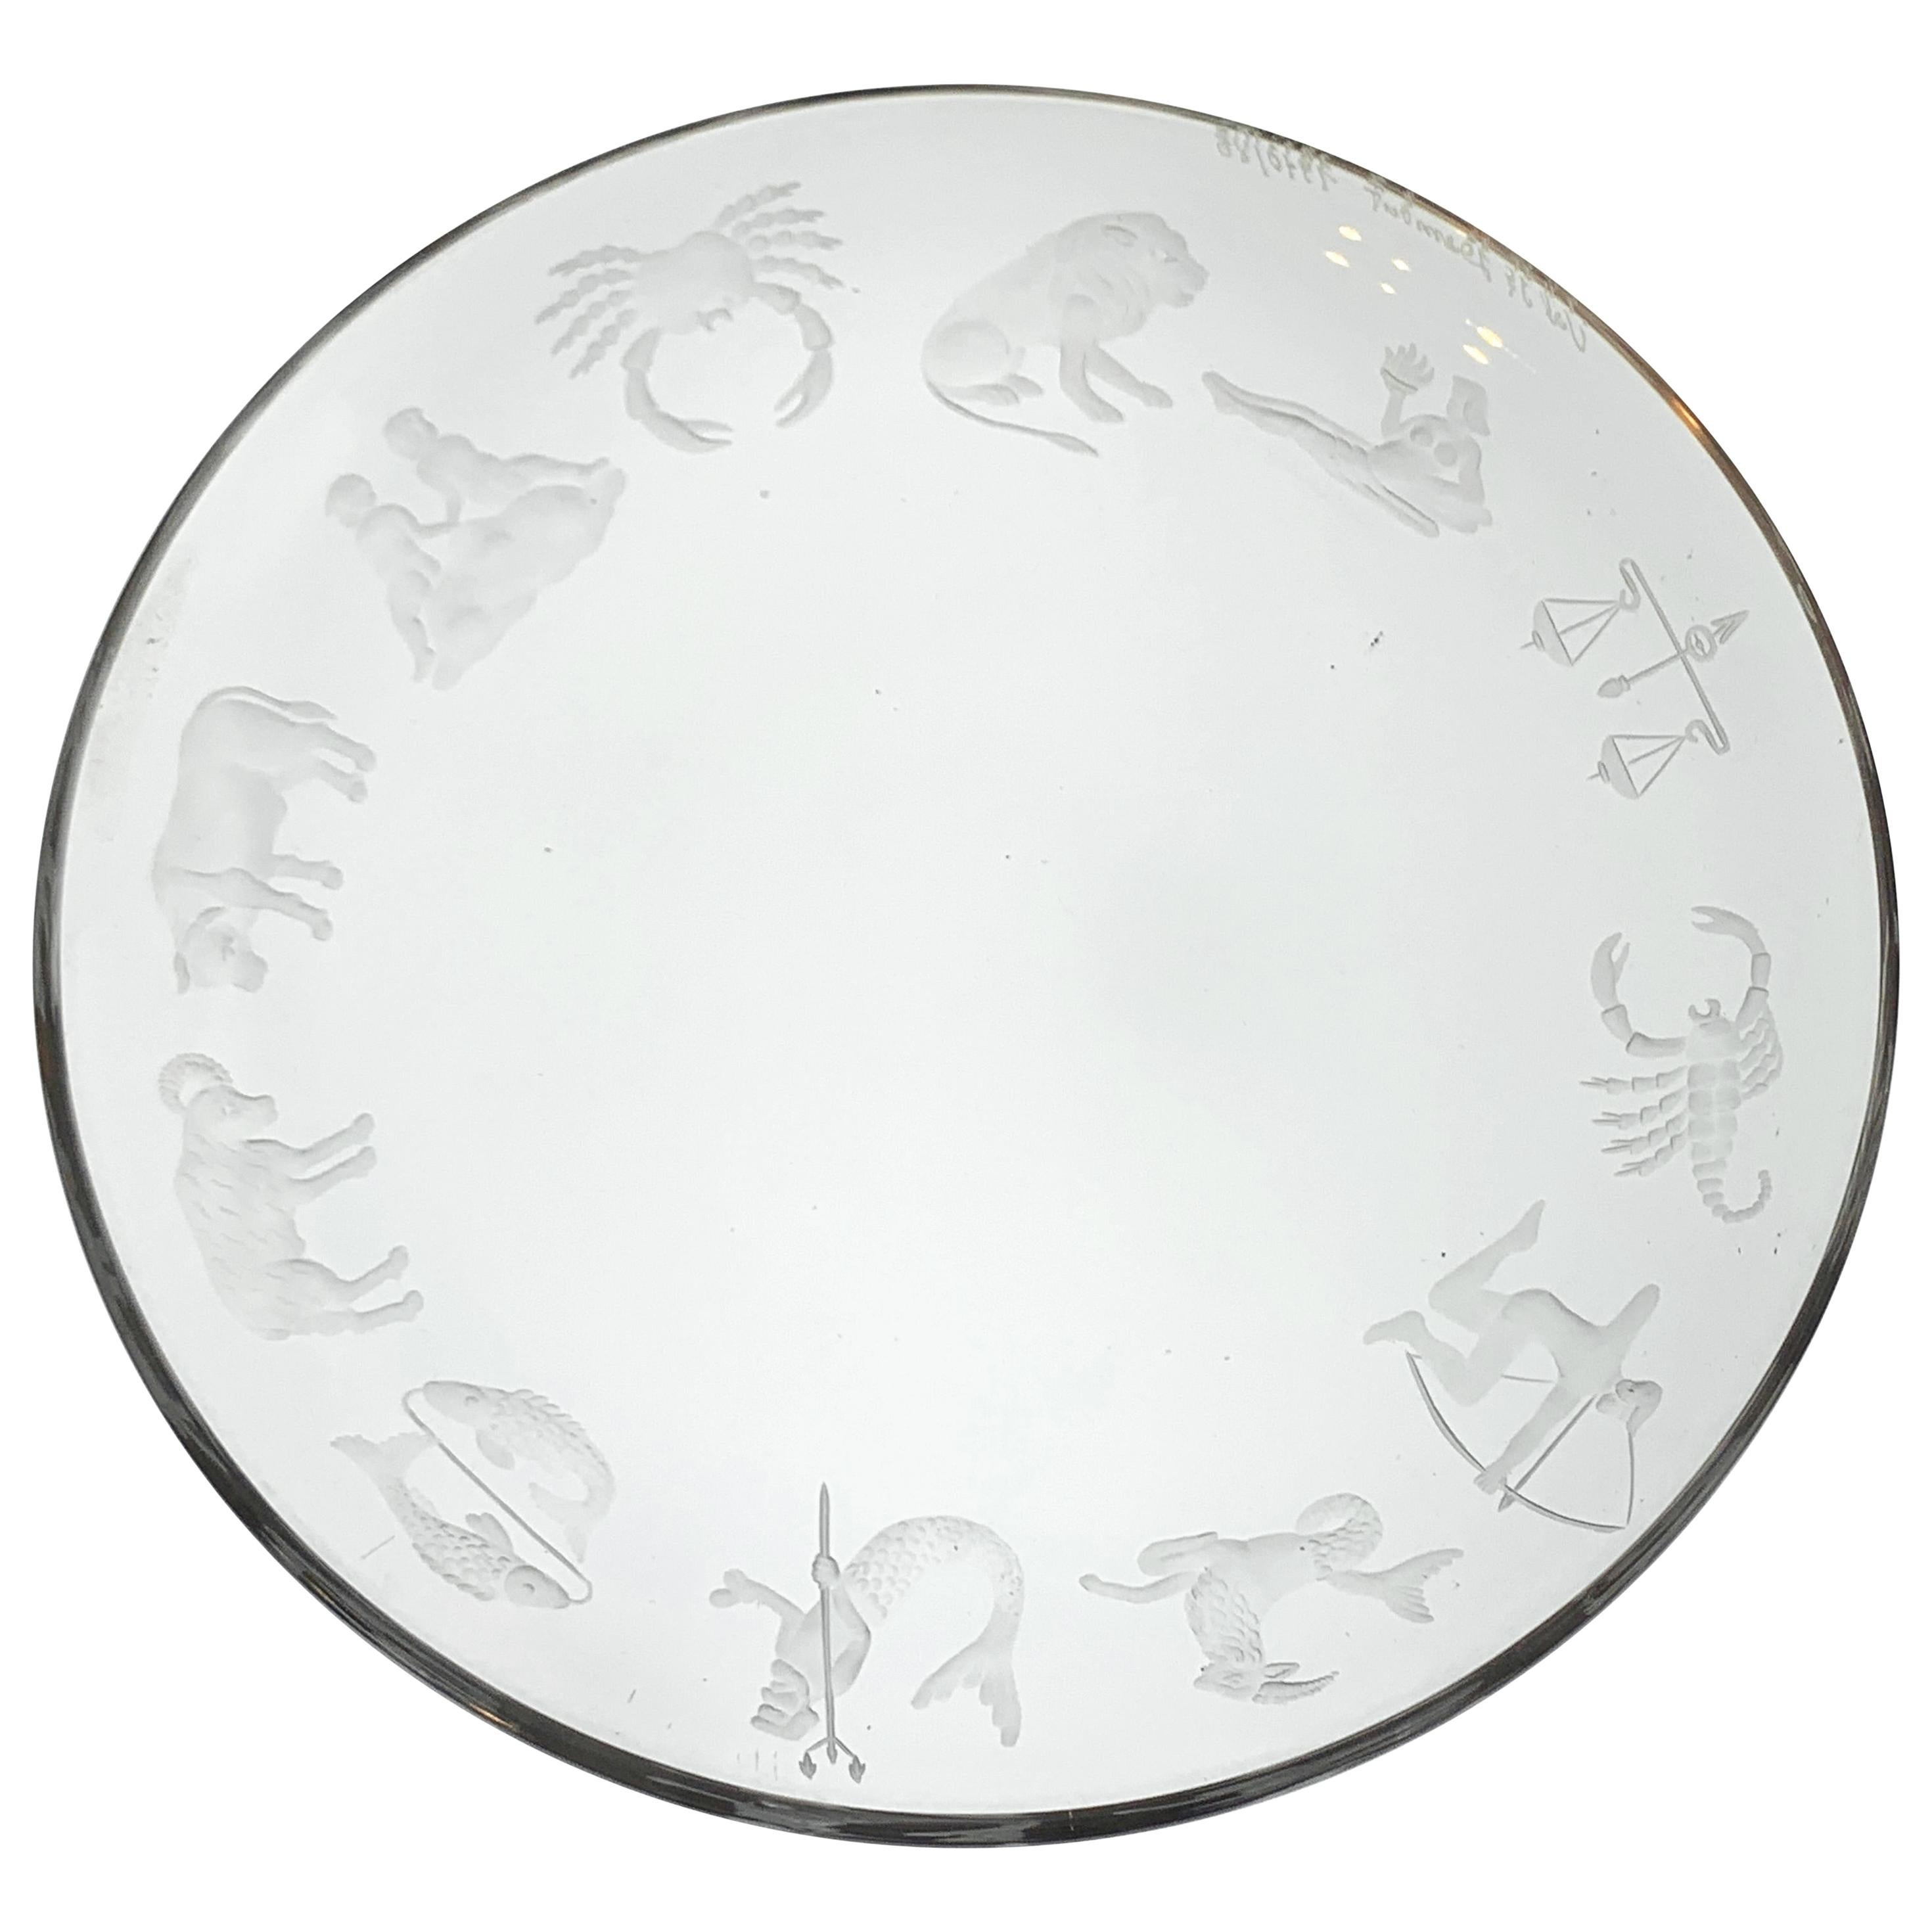 Val St. Lambert, Engraved Zodiac Charger